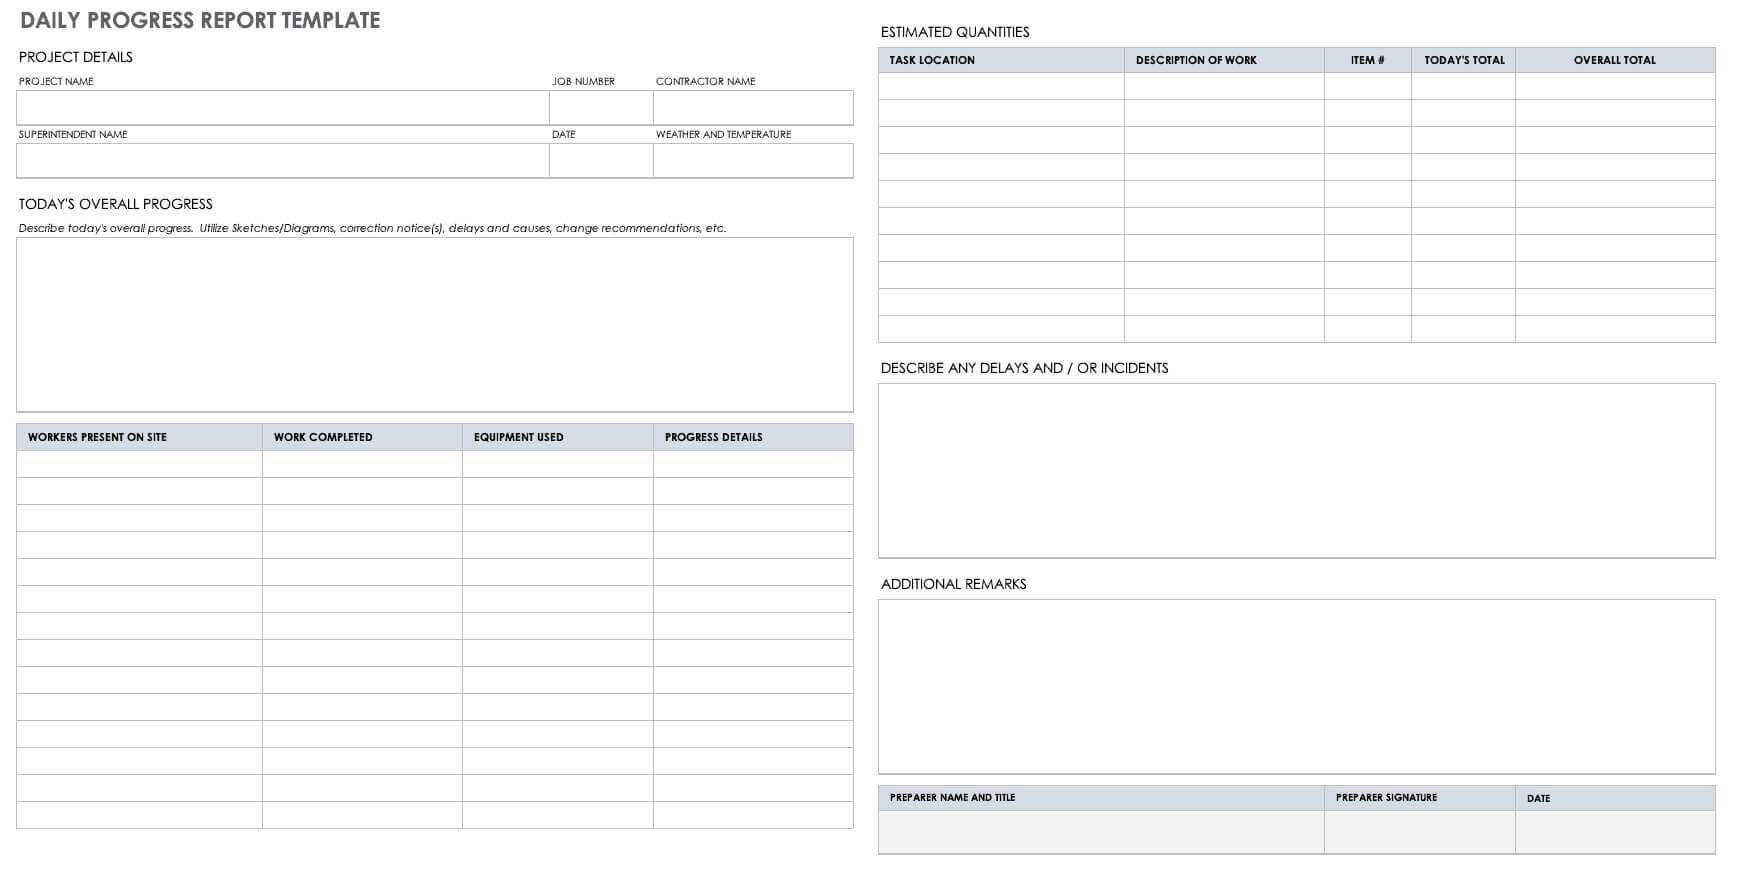 012 Project Status Report Template Excel Download Filetype In Project Status Report Template Excel Download Filetype Xls